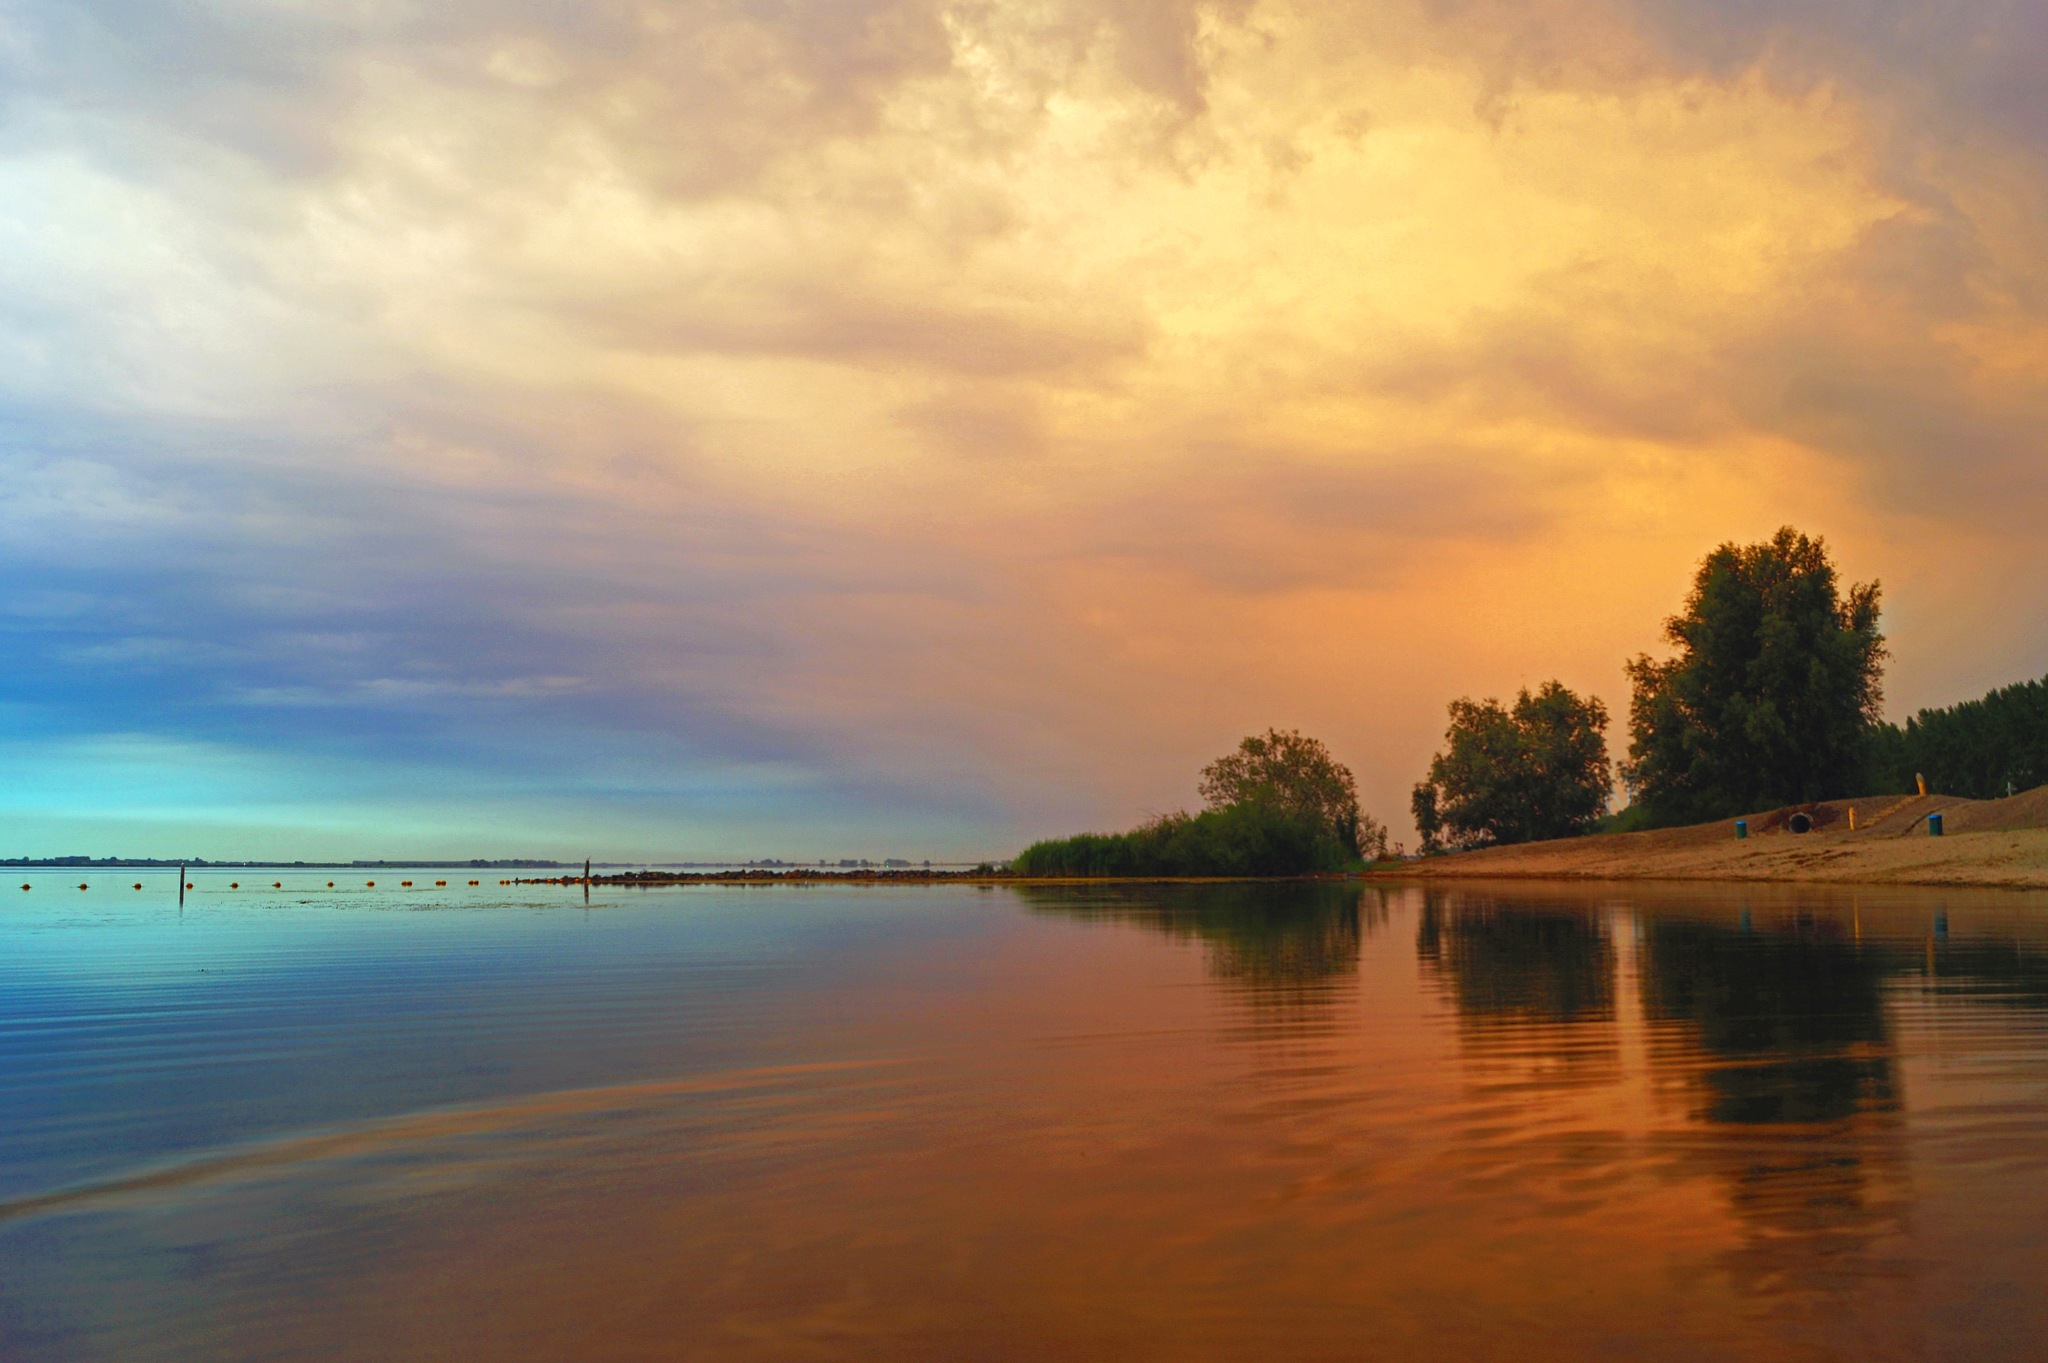 Dawn Clouds by Marian Baay